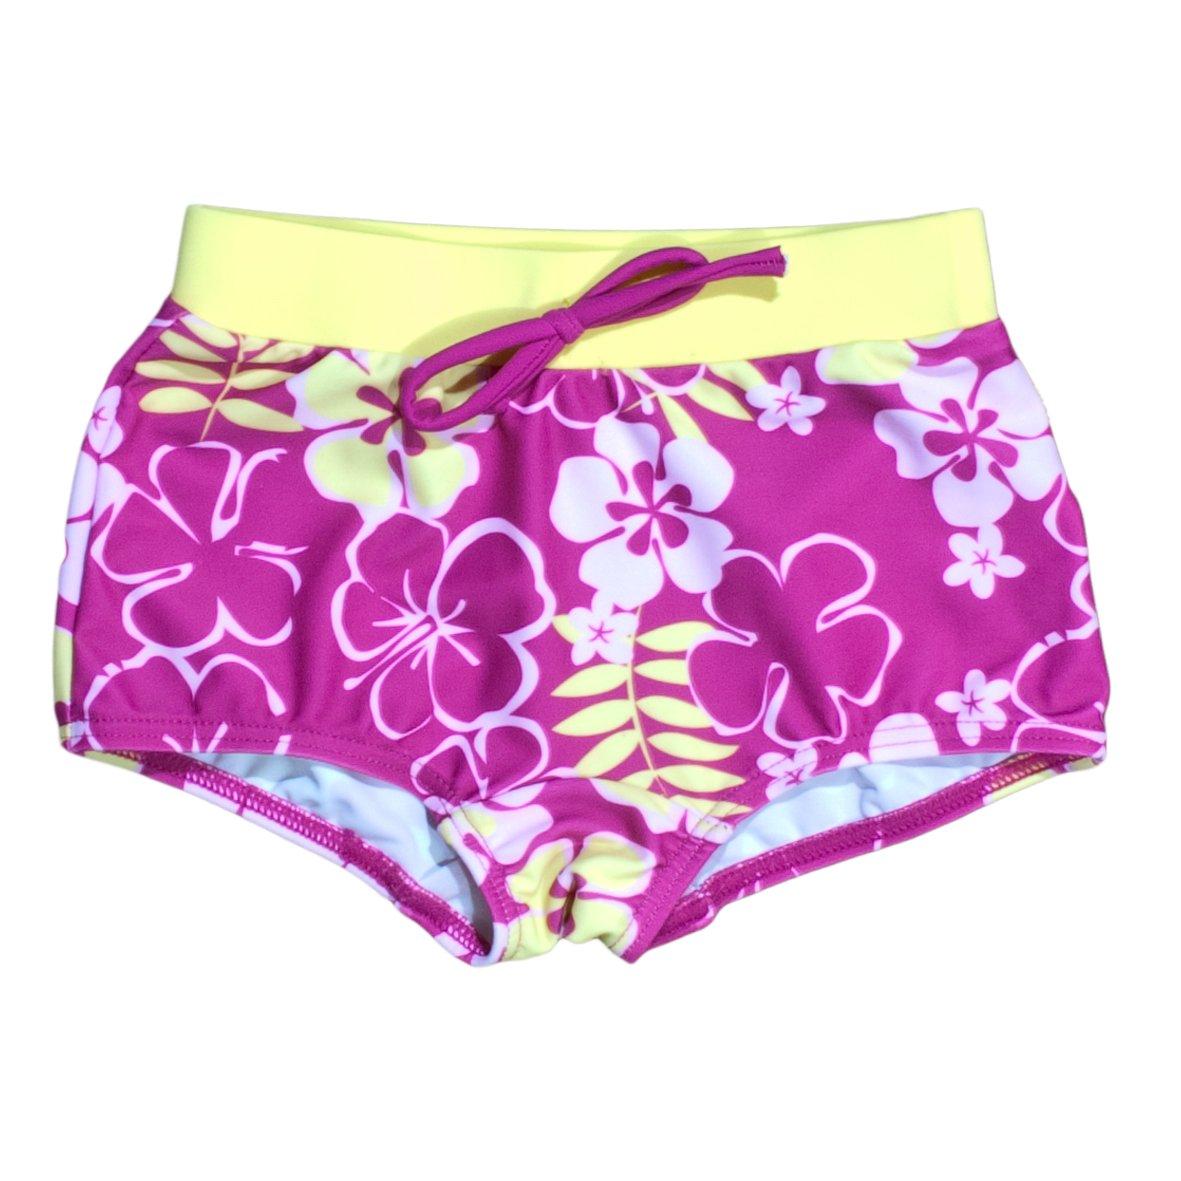 Baby Banz Girls 2-6X Boy Length UV Board Shorts, Sunblossom, 2 Years S13BL-SB-2